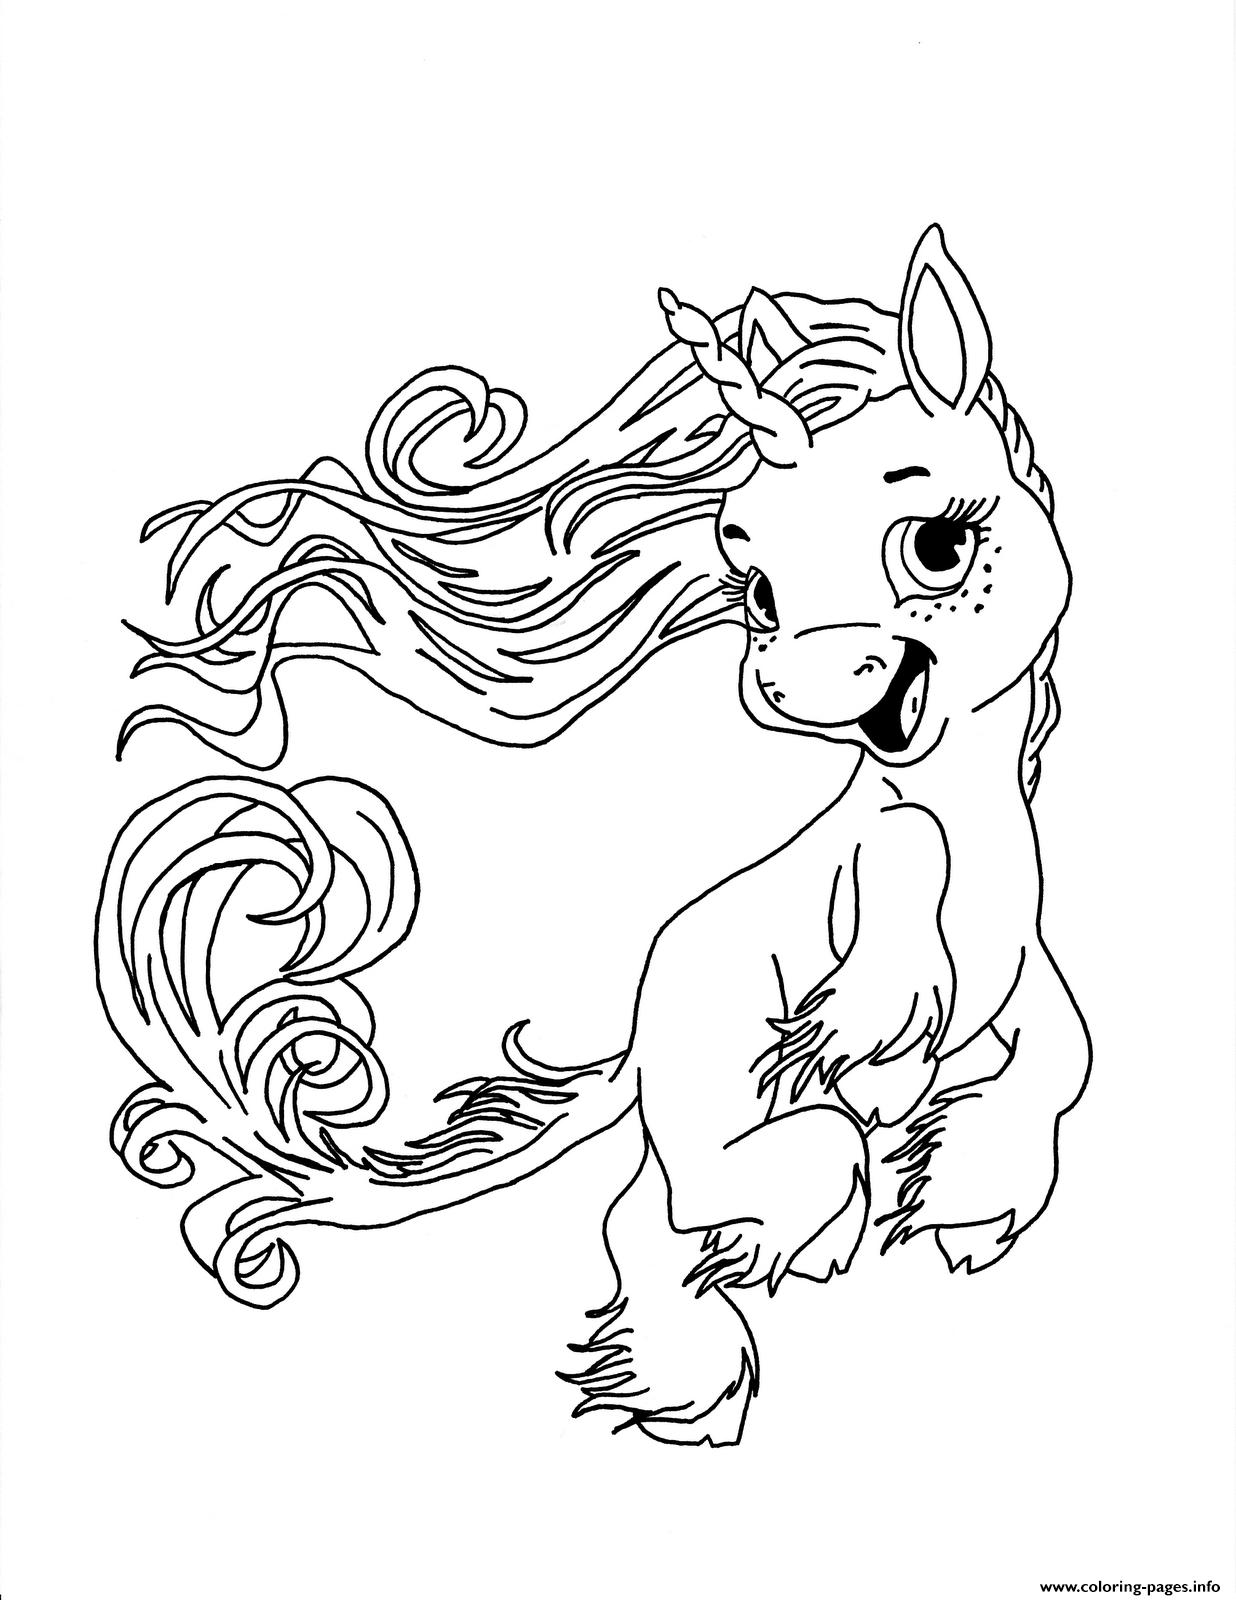 Princesses Coloring Online | 1600x1236